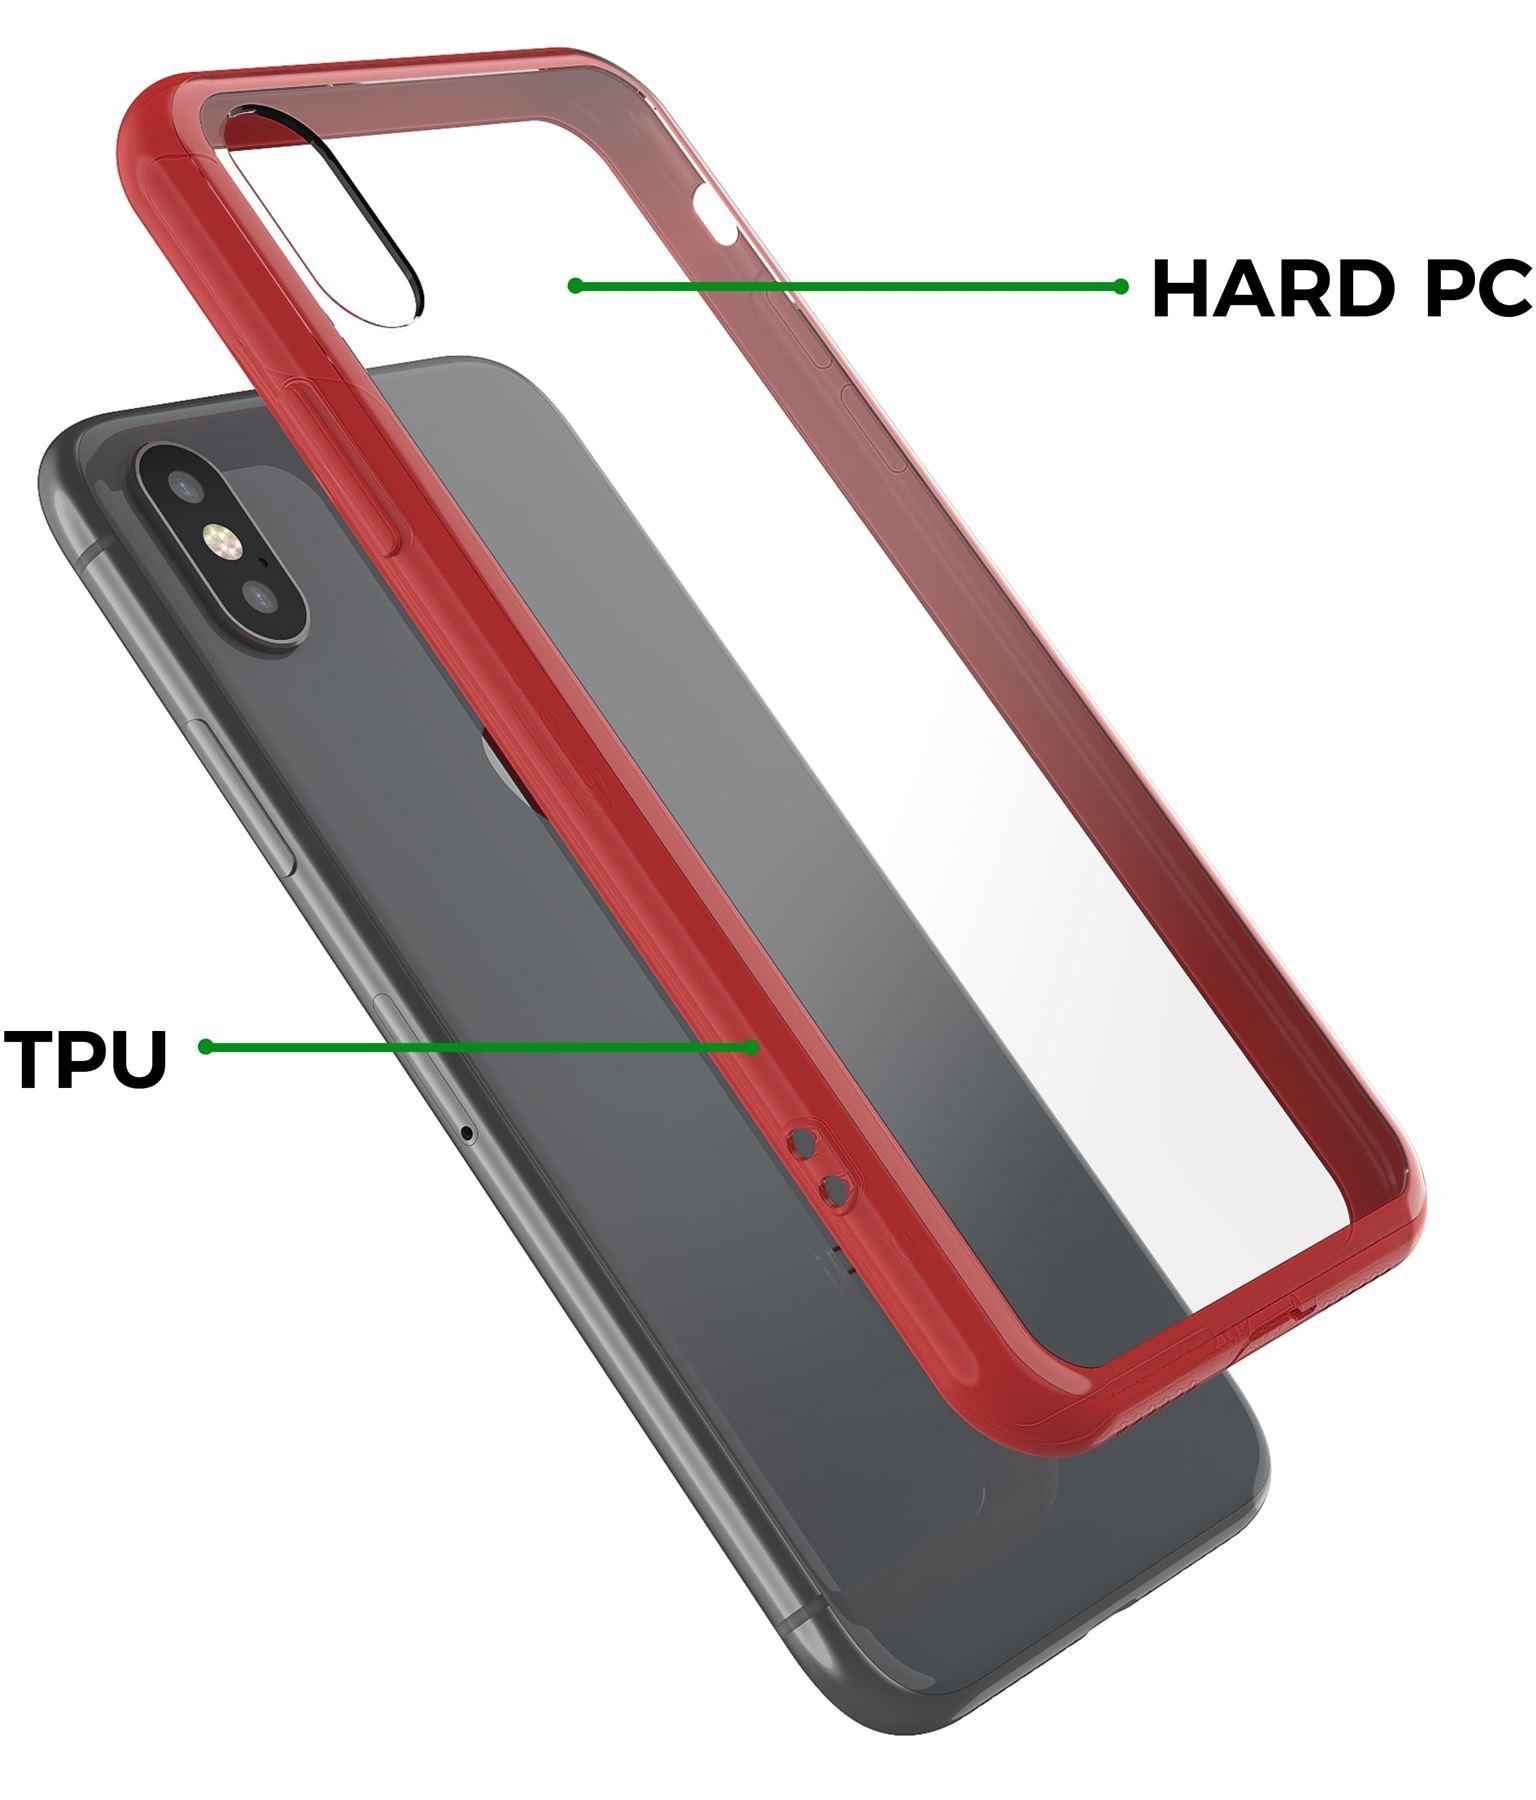 thumbnail 22 - For Apple iPhone XR Xs Max X 8 7 Plus 6 5 Se Case Cover Clear Transparent CS283